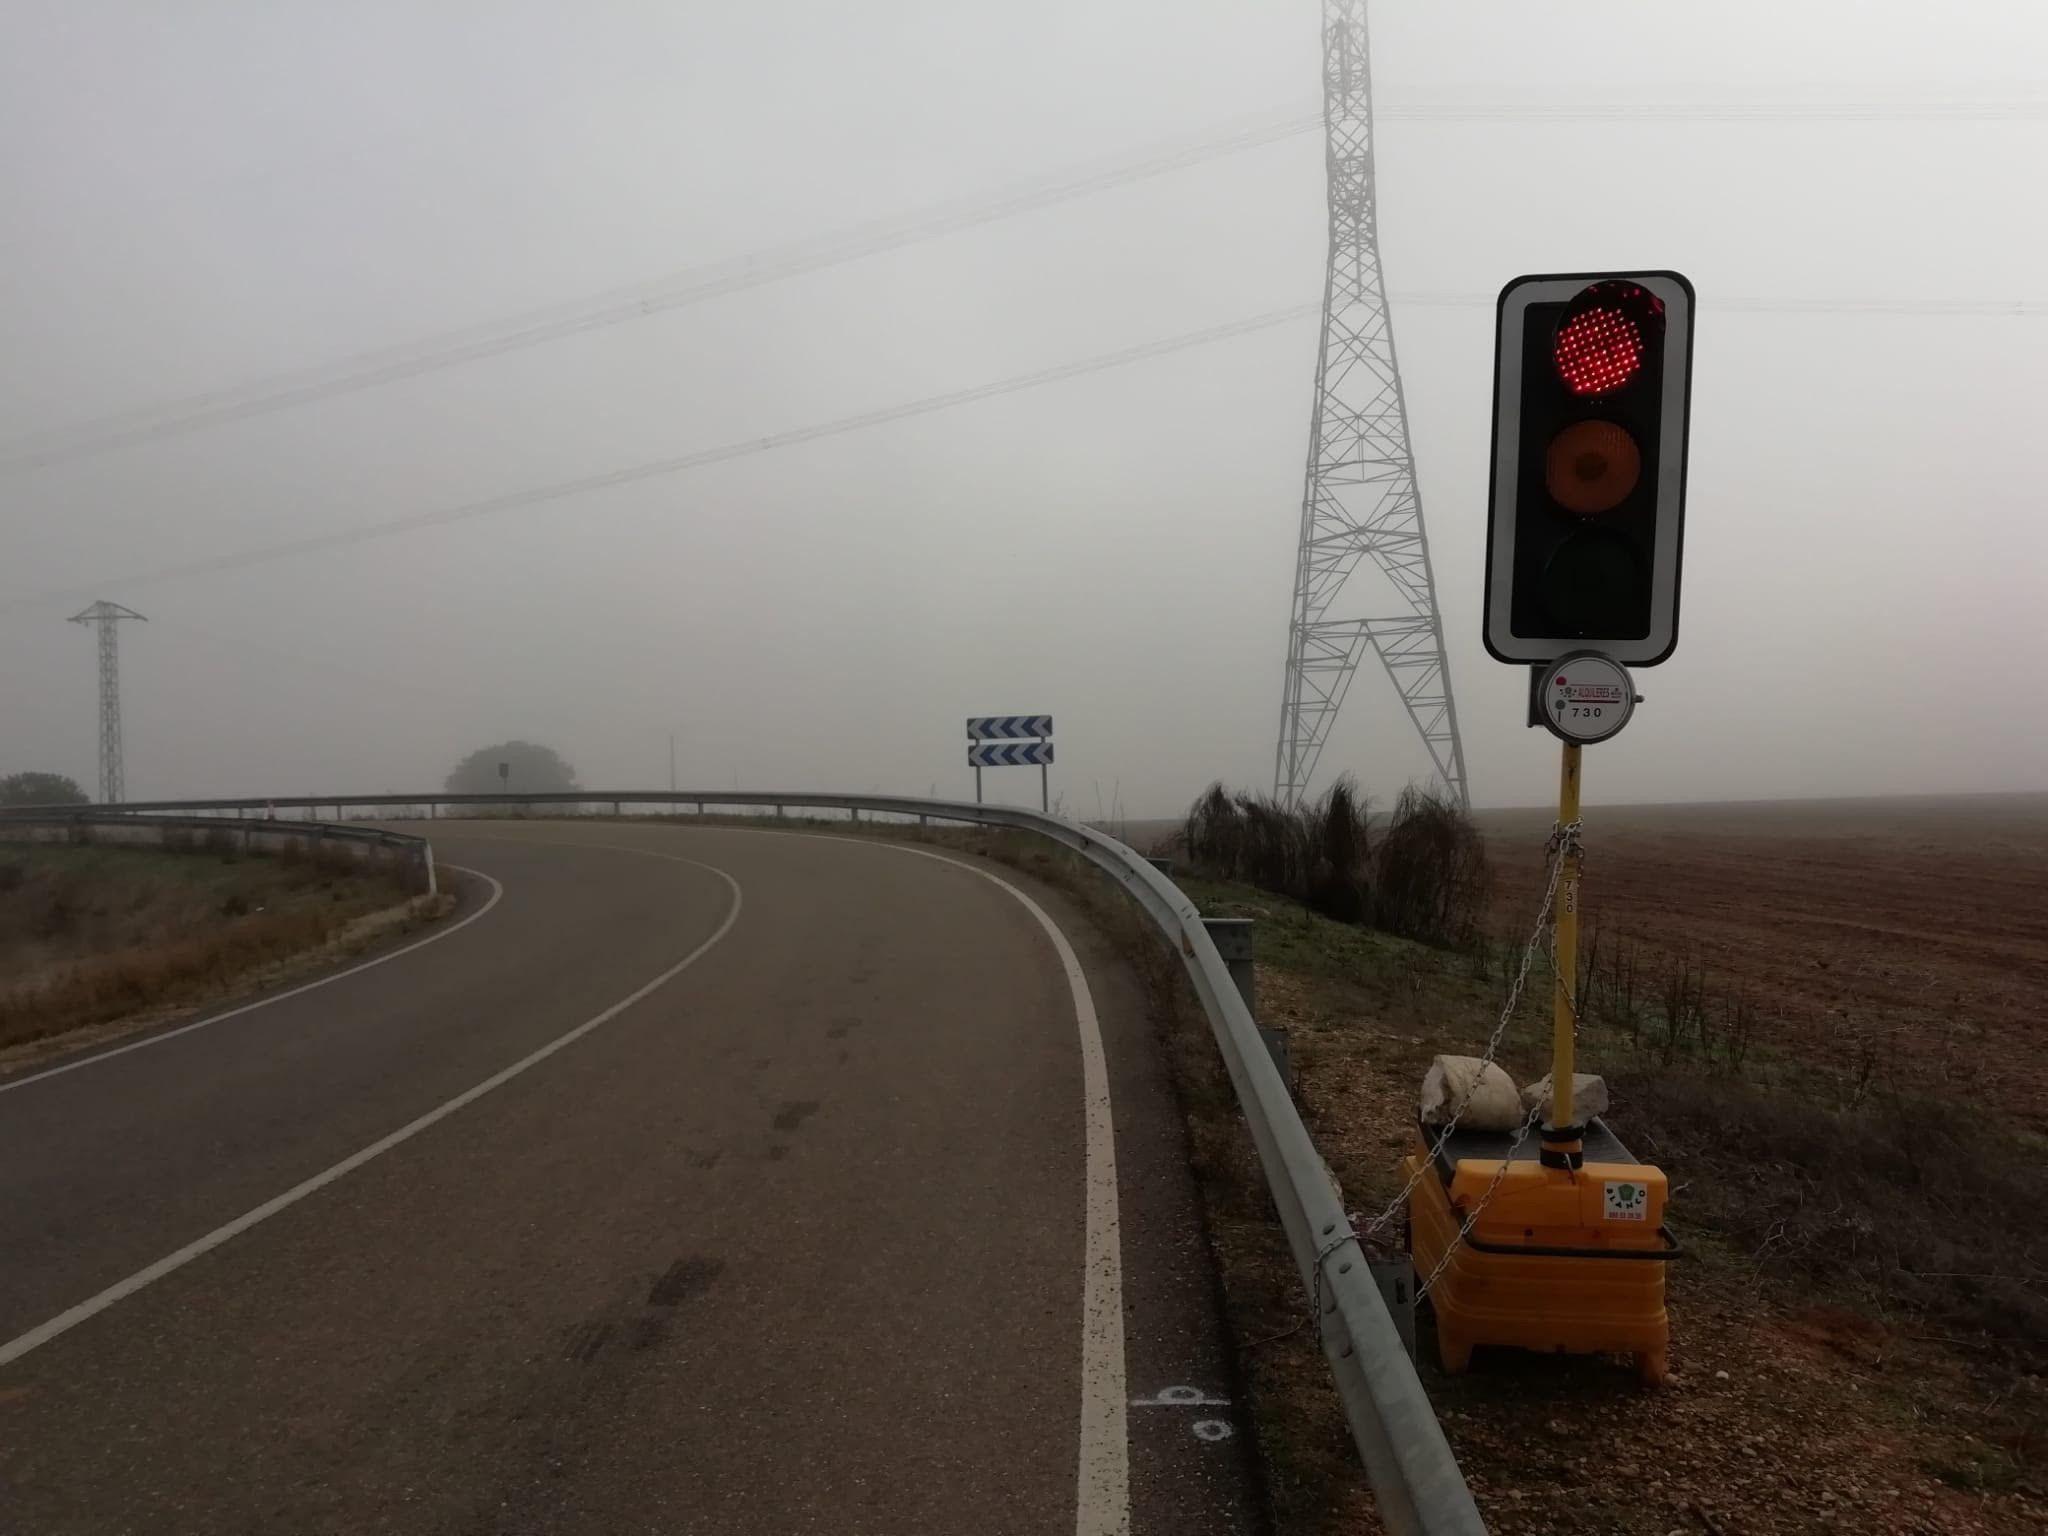 Andavias viaducto tren psoe accidente (1)